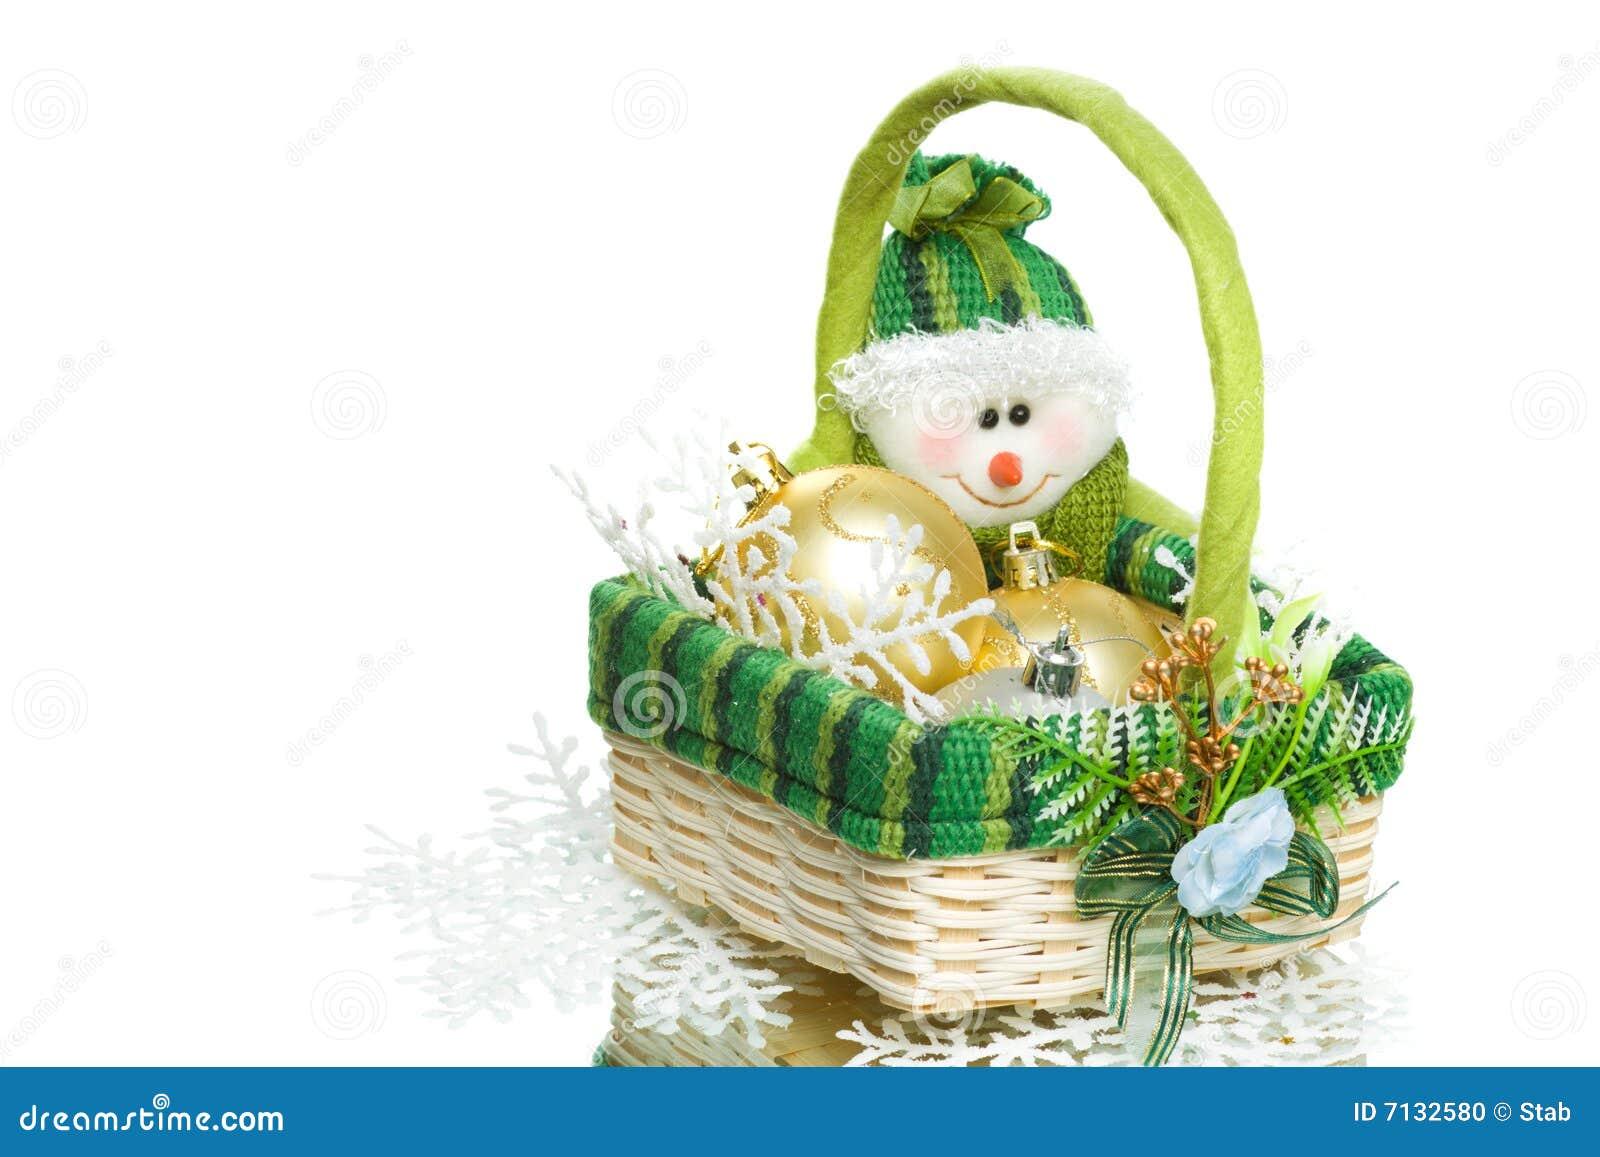 Christmas Decoration Set In Wicker Basket Stock Photo